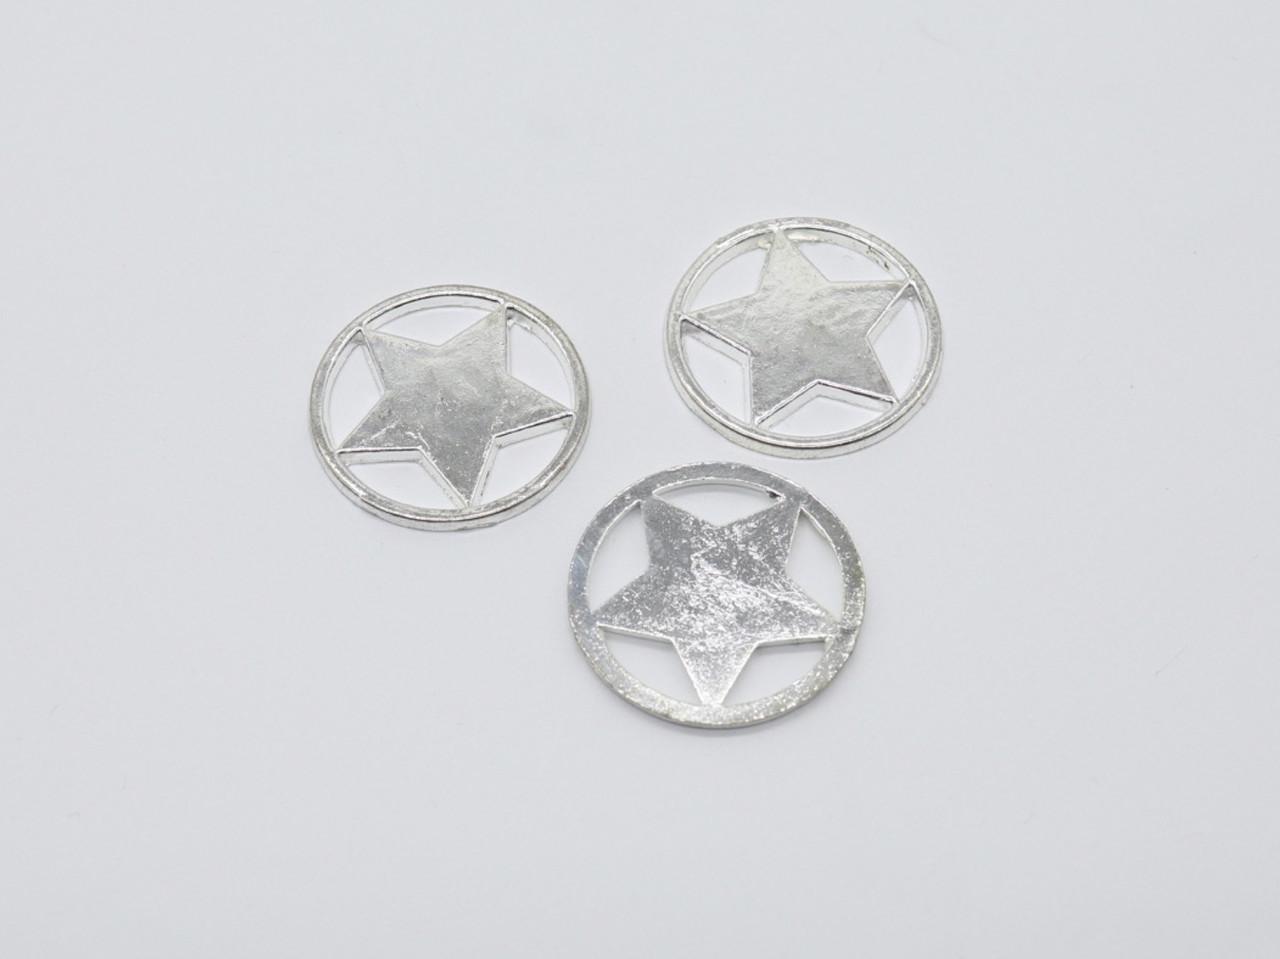 Заготовки для рукоделия. Цвет серебро. 32мм